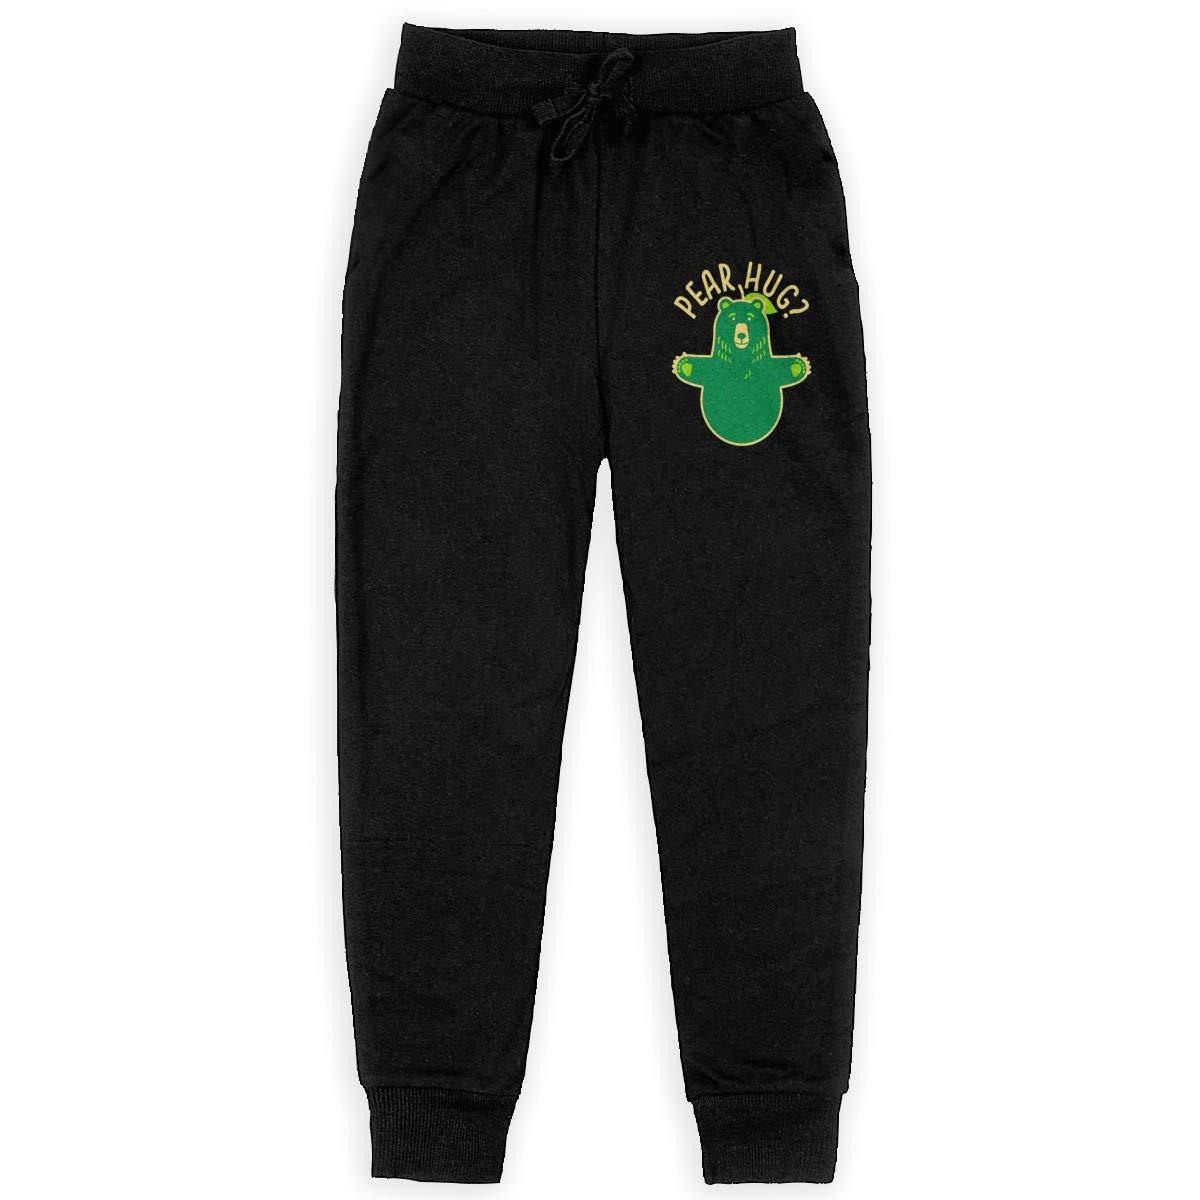 Dunpaiaa PEAR Hug Boys Sweatpants,Joggers Sport Training Pants Trousers Black